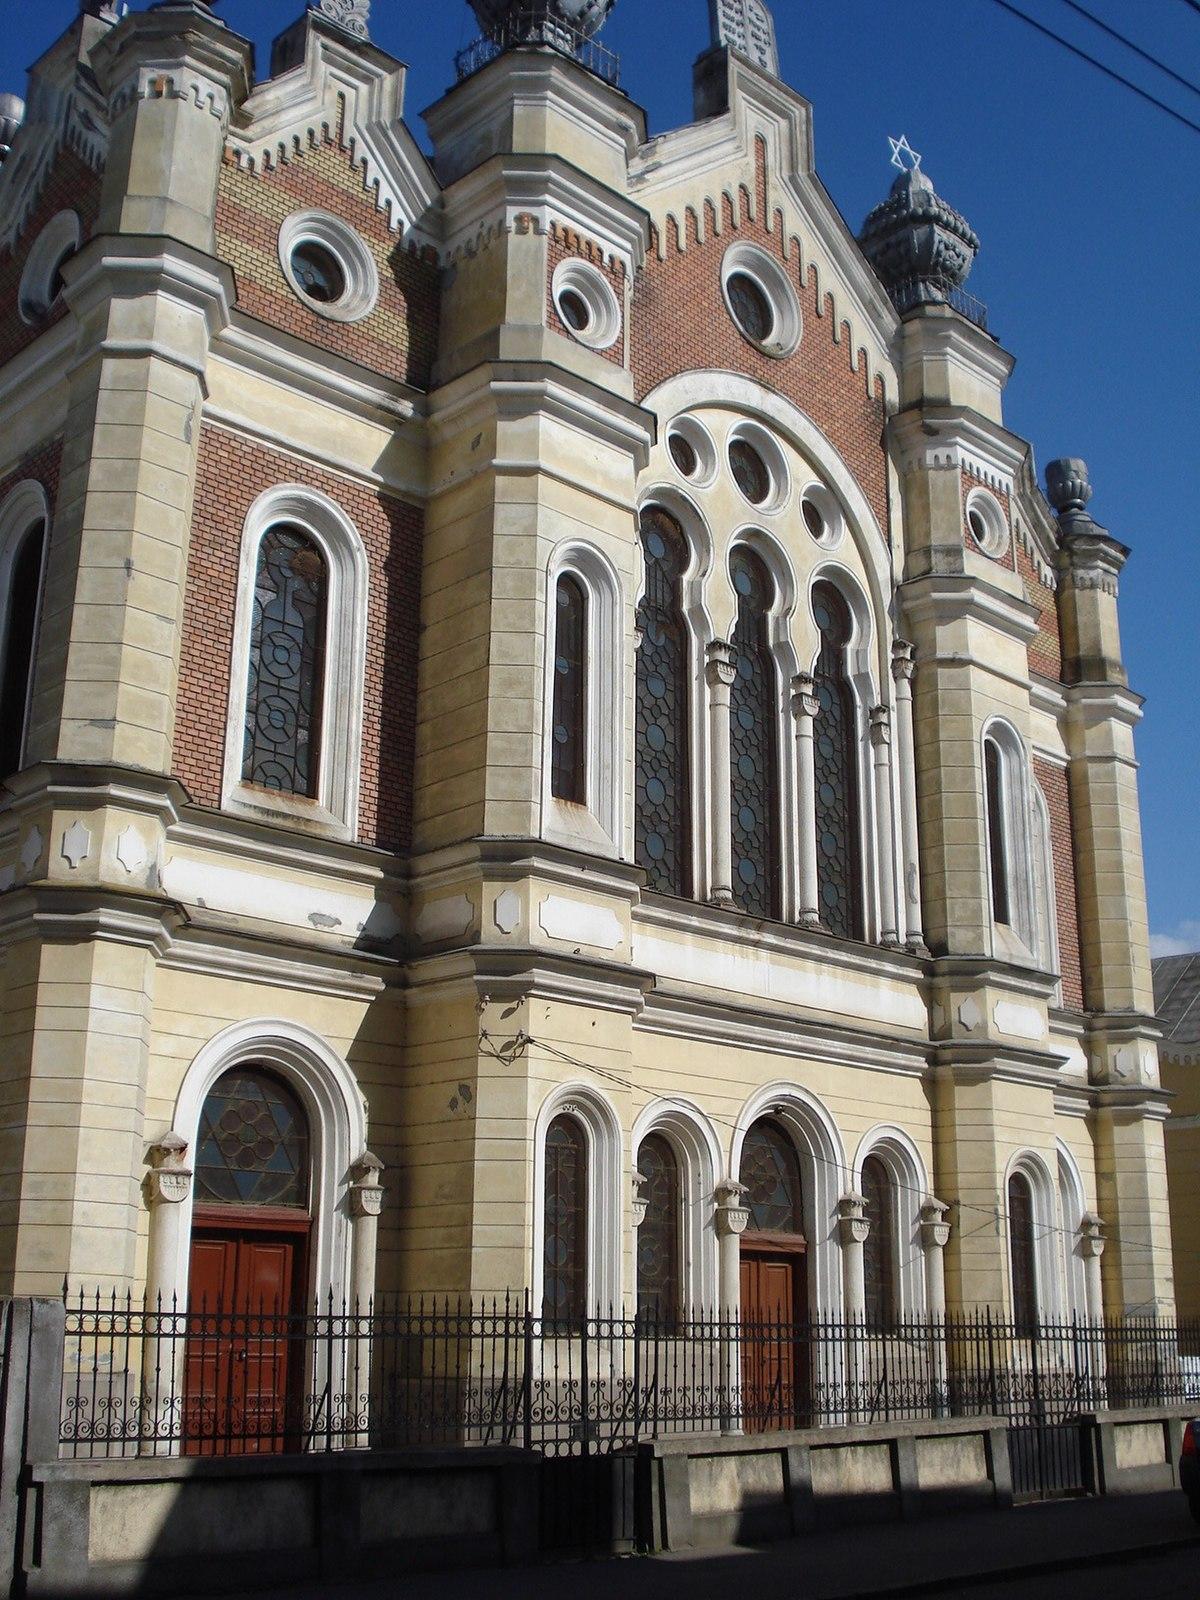 Satu Mare Synagogue